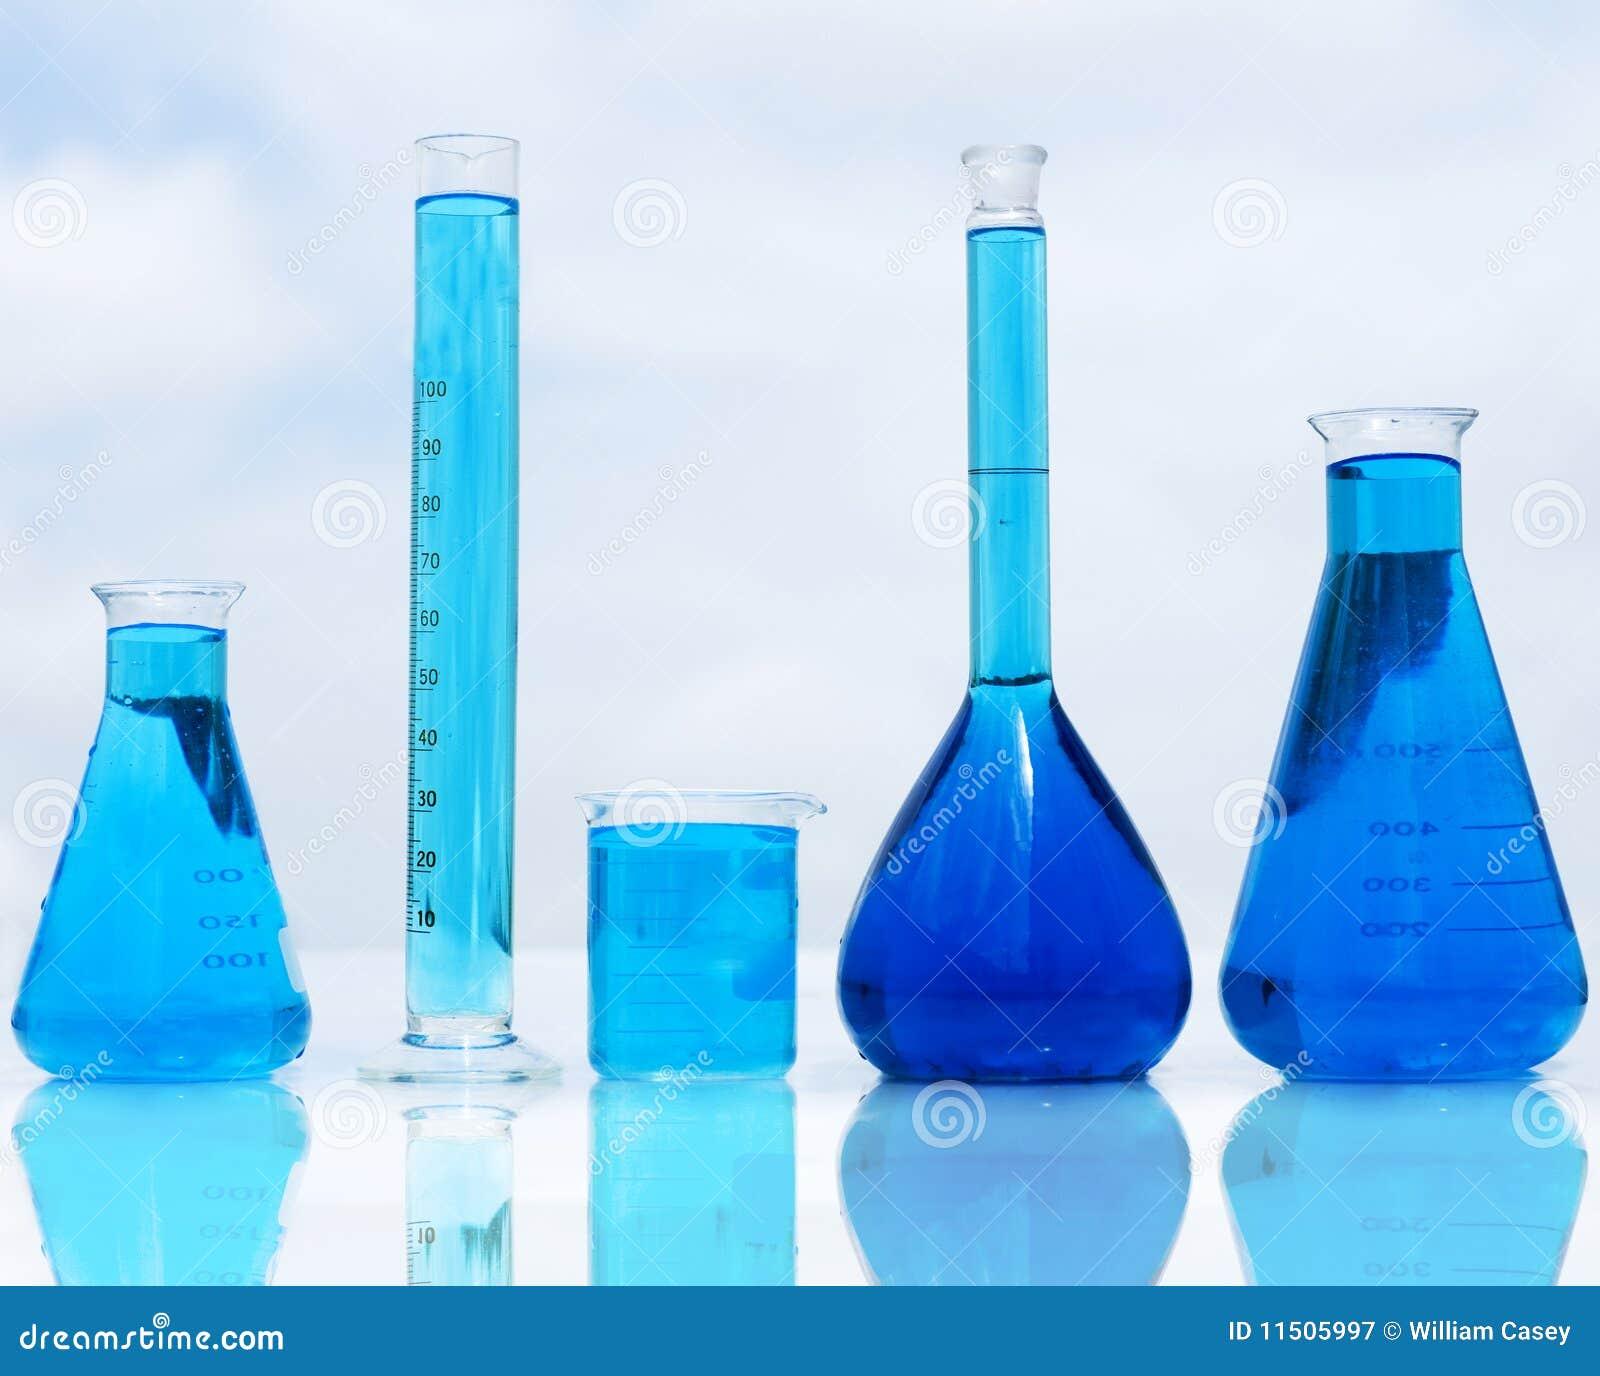 Chemistry Lab Equipment Of laboratory equipment